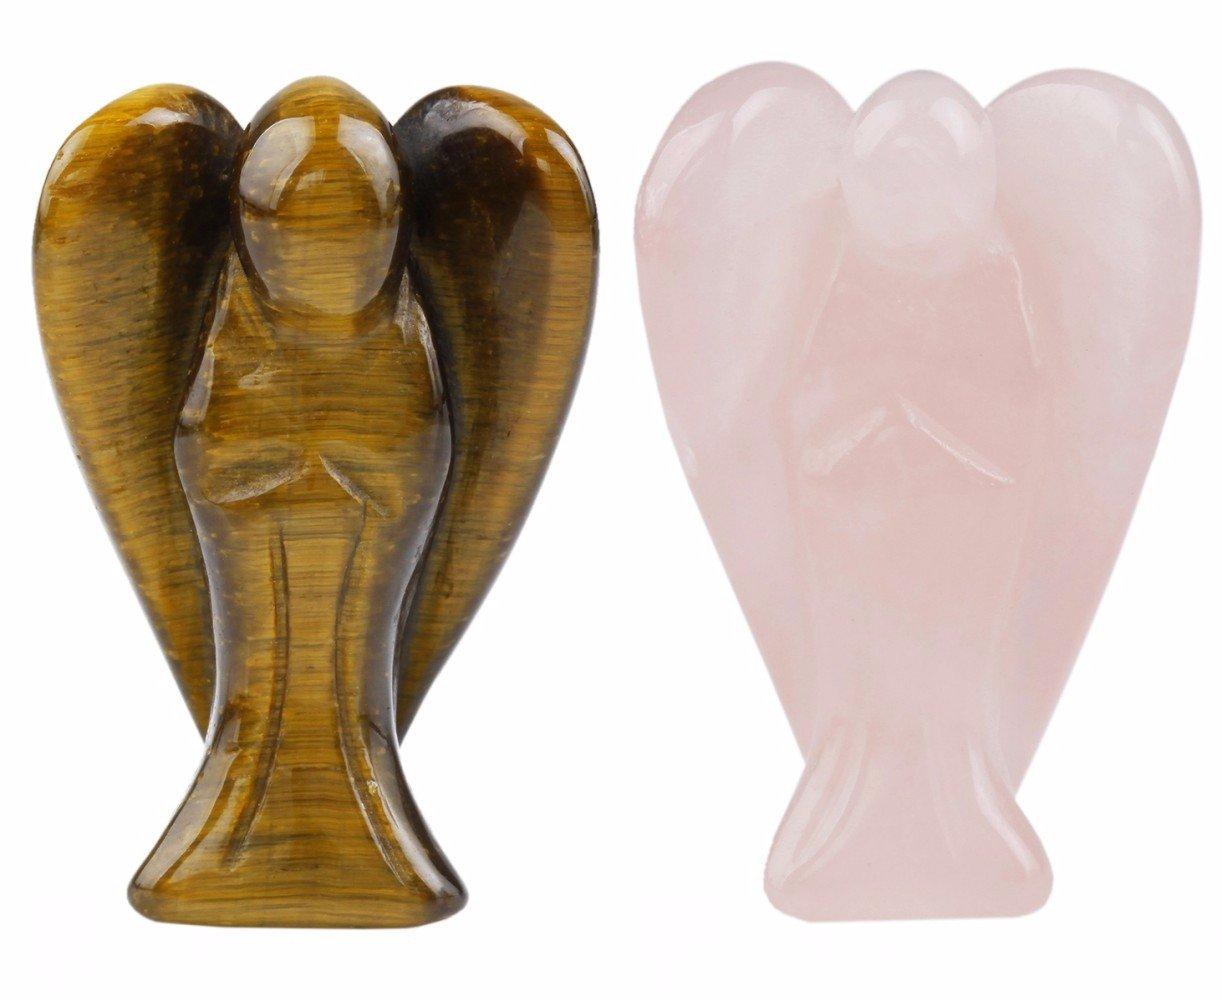 rockcloud Healing Crystal Gemstone Carved Pocket Guardian Angel Figurines 1.5 inch